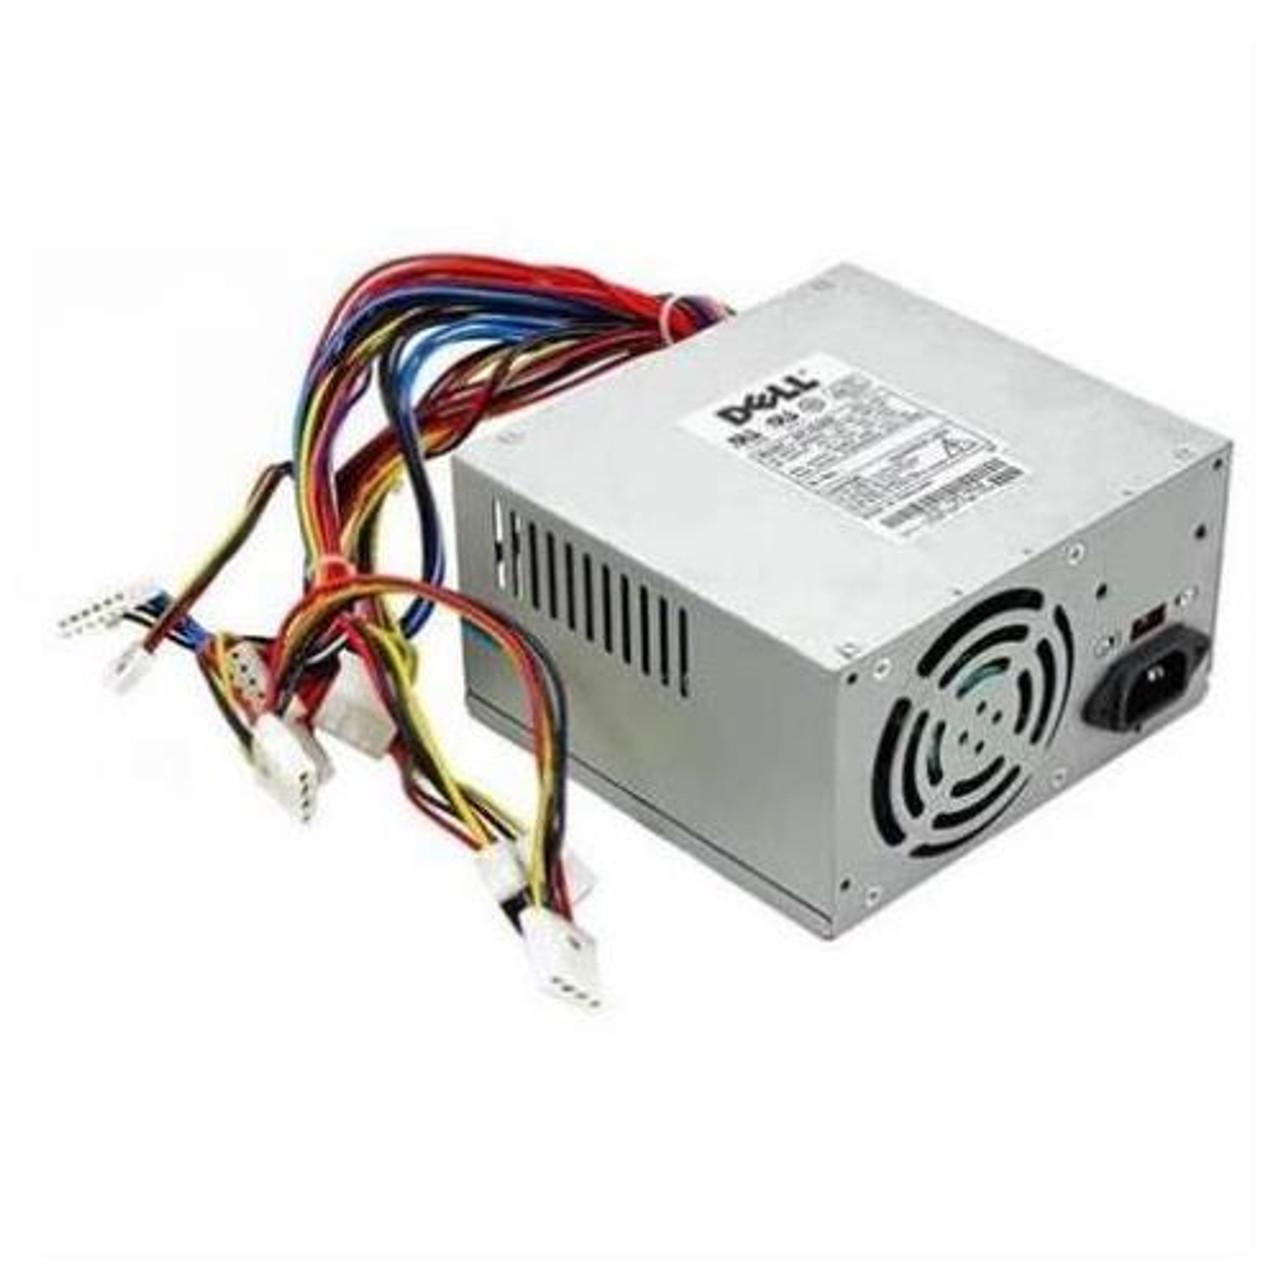 2G39V Dell Poweredge R710 870w Power Supply